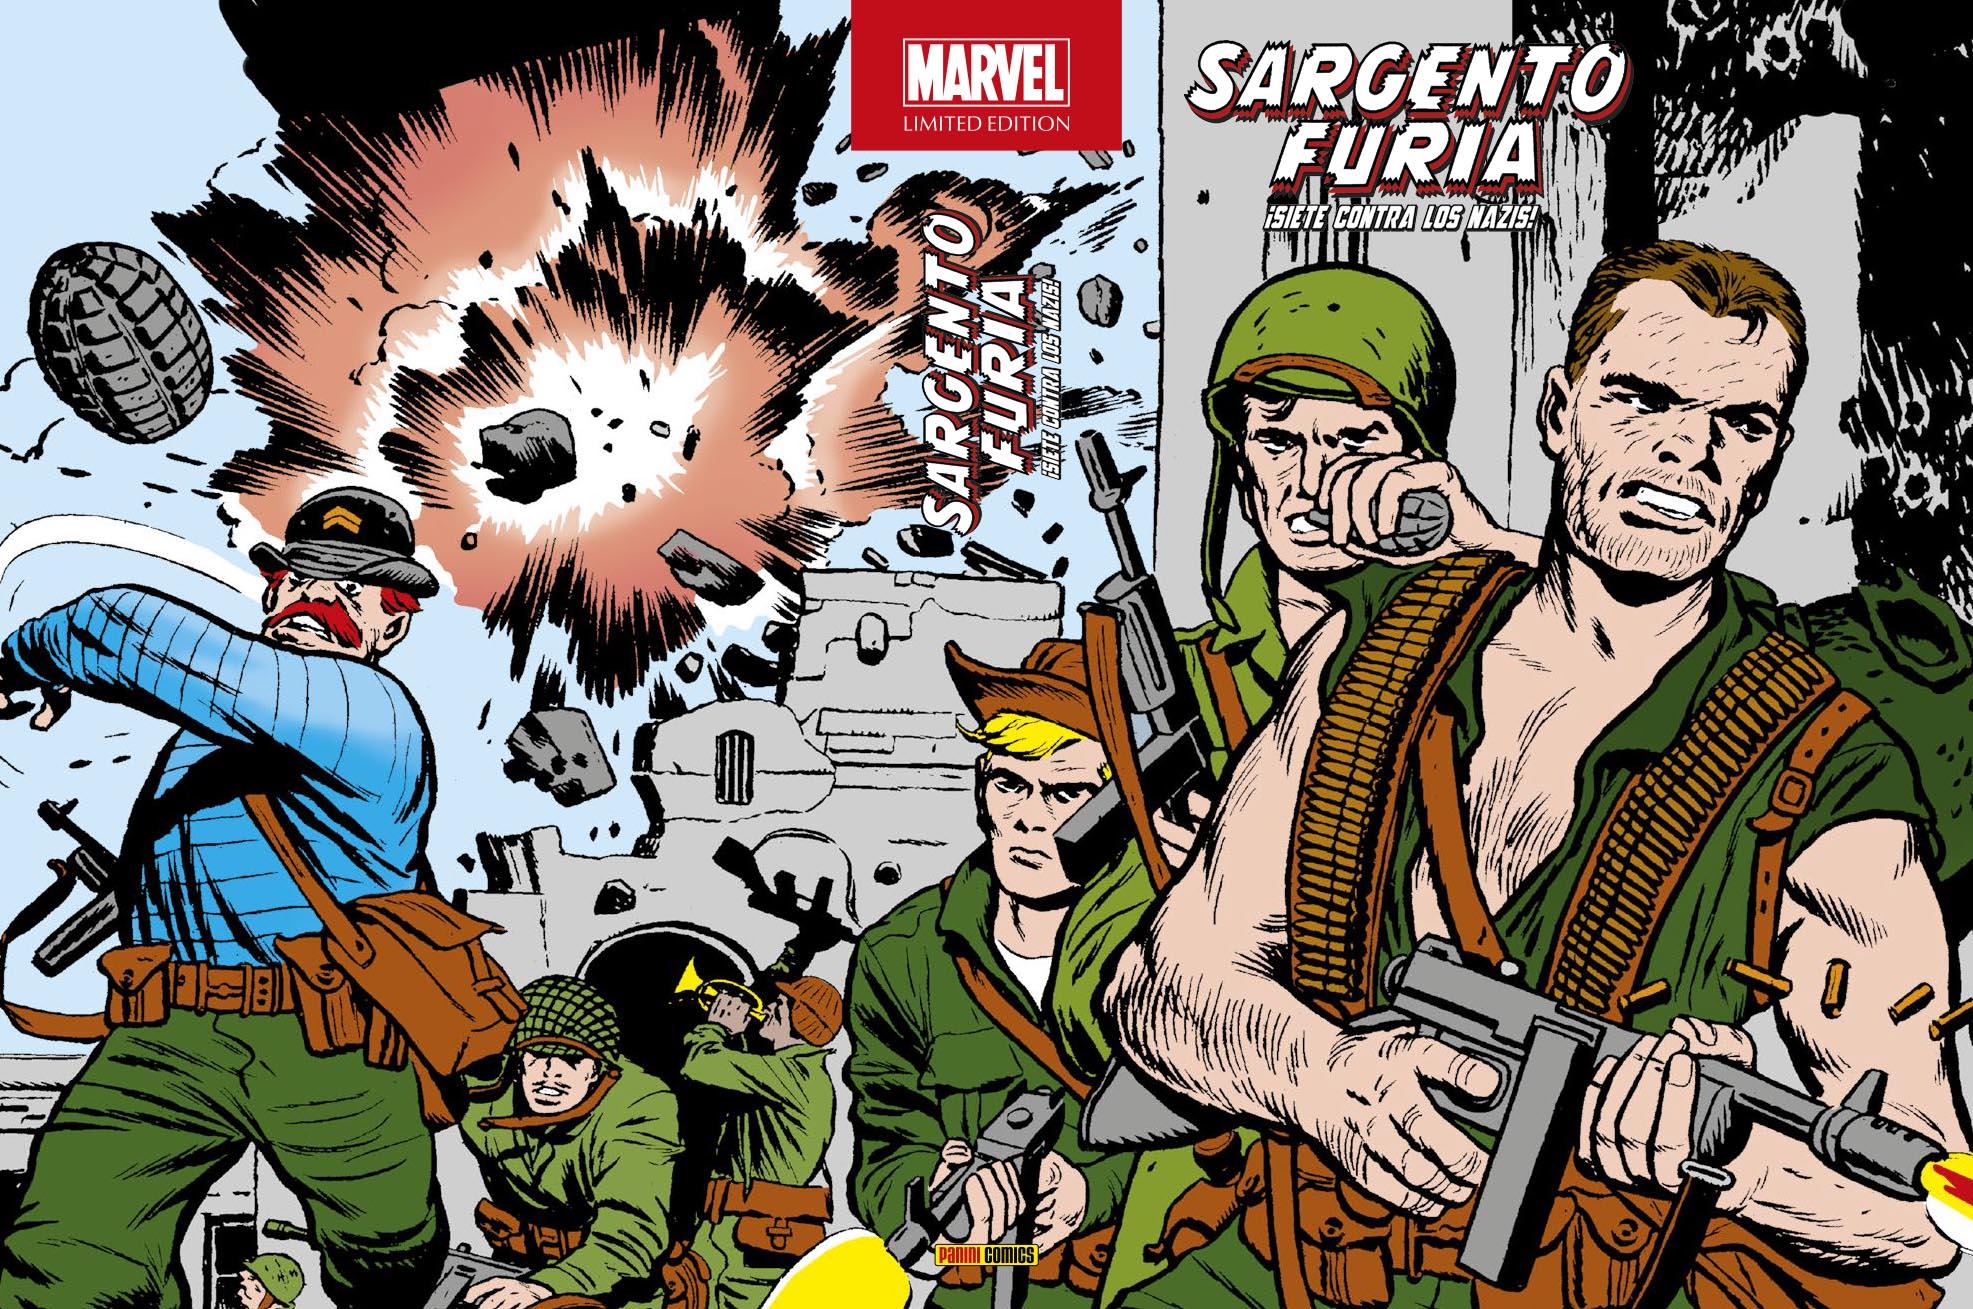 Marvel Limited Edition. Sargento Furia Siete contra los nazis completa